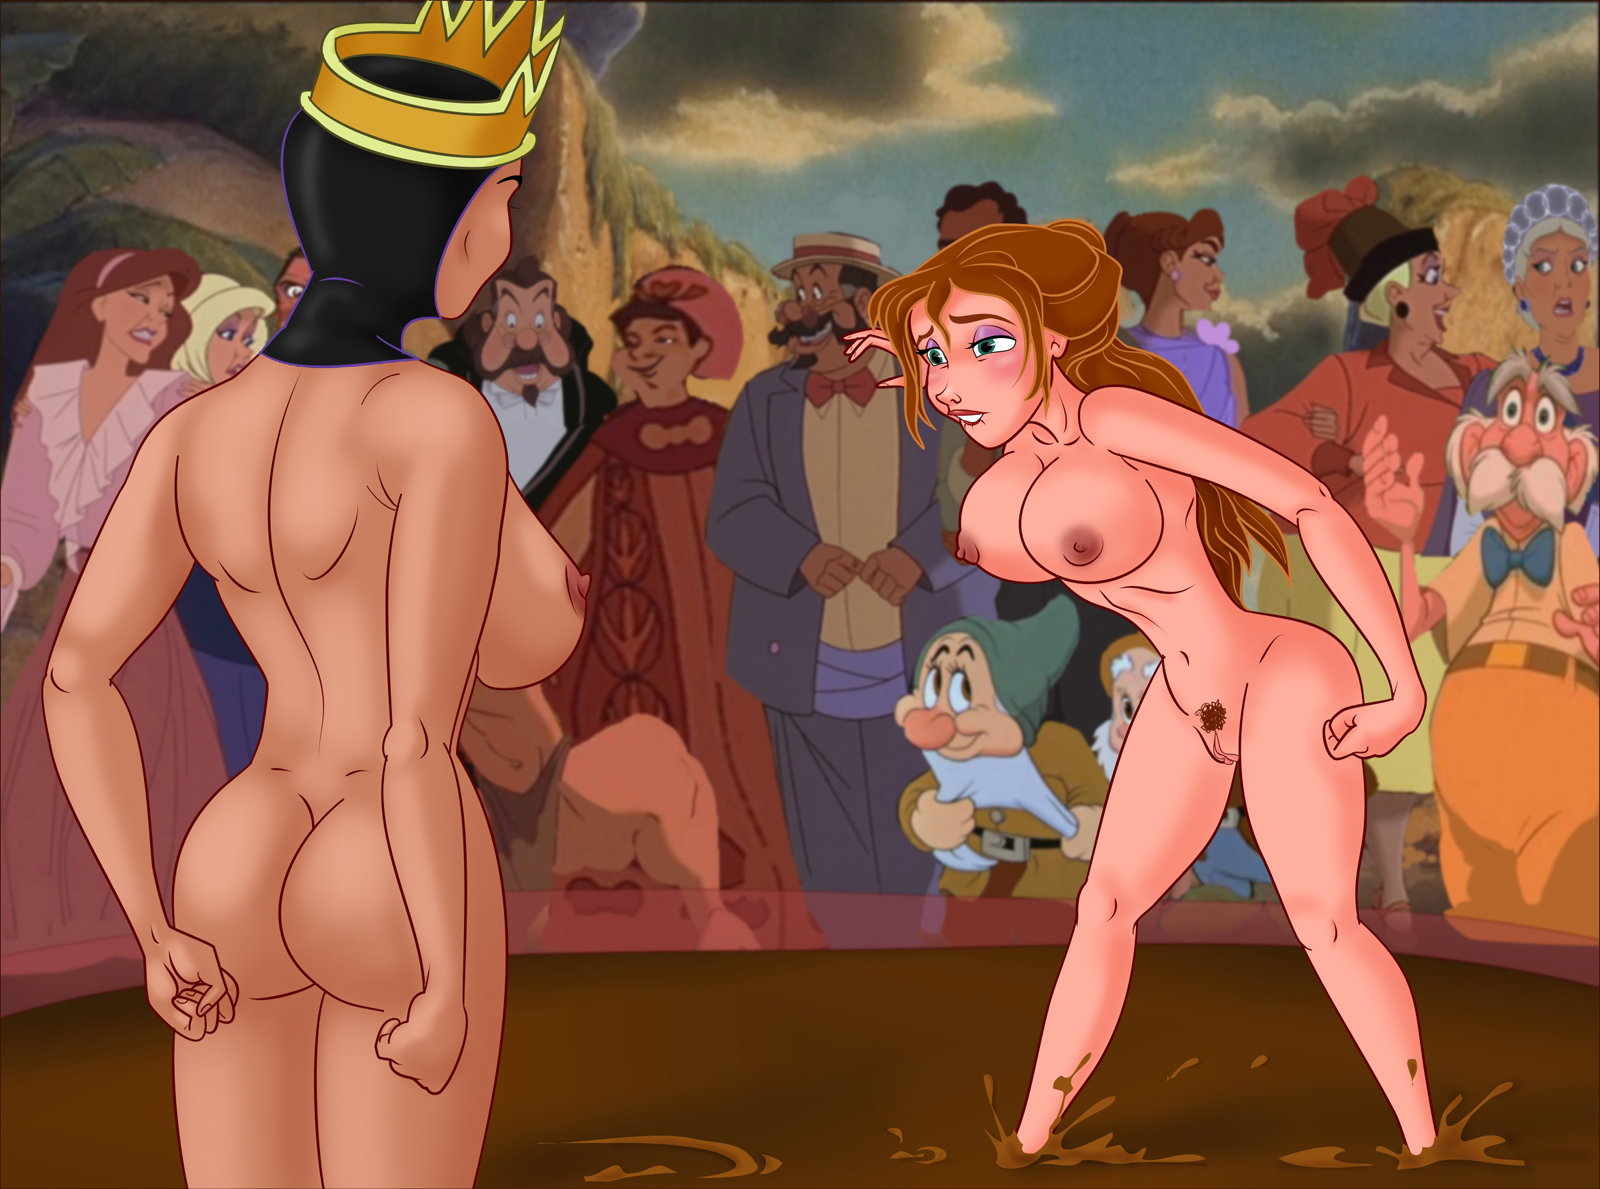 SureFap xxx porno Crossover - [XL-Toons] - Jane Porter Vs. Queen Grimhilde